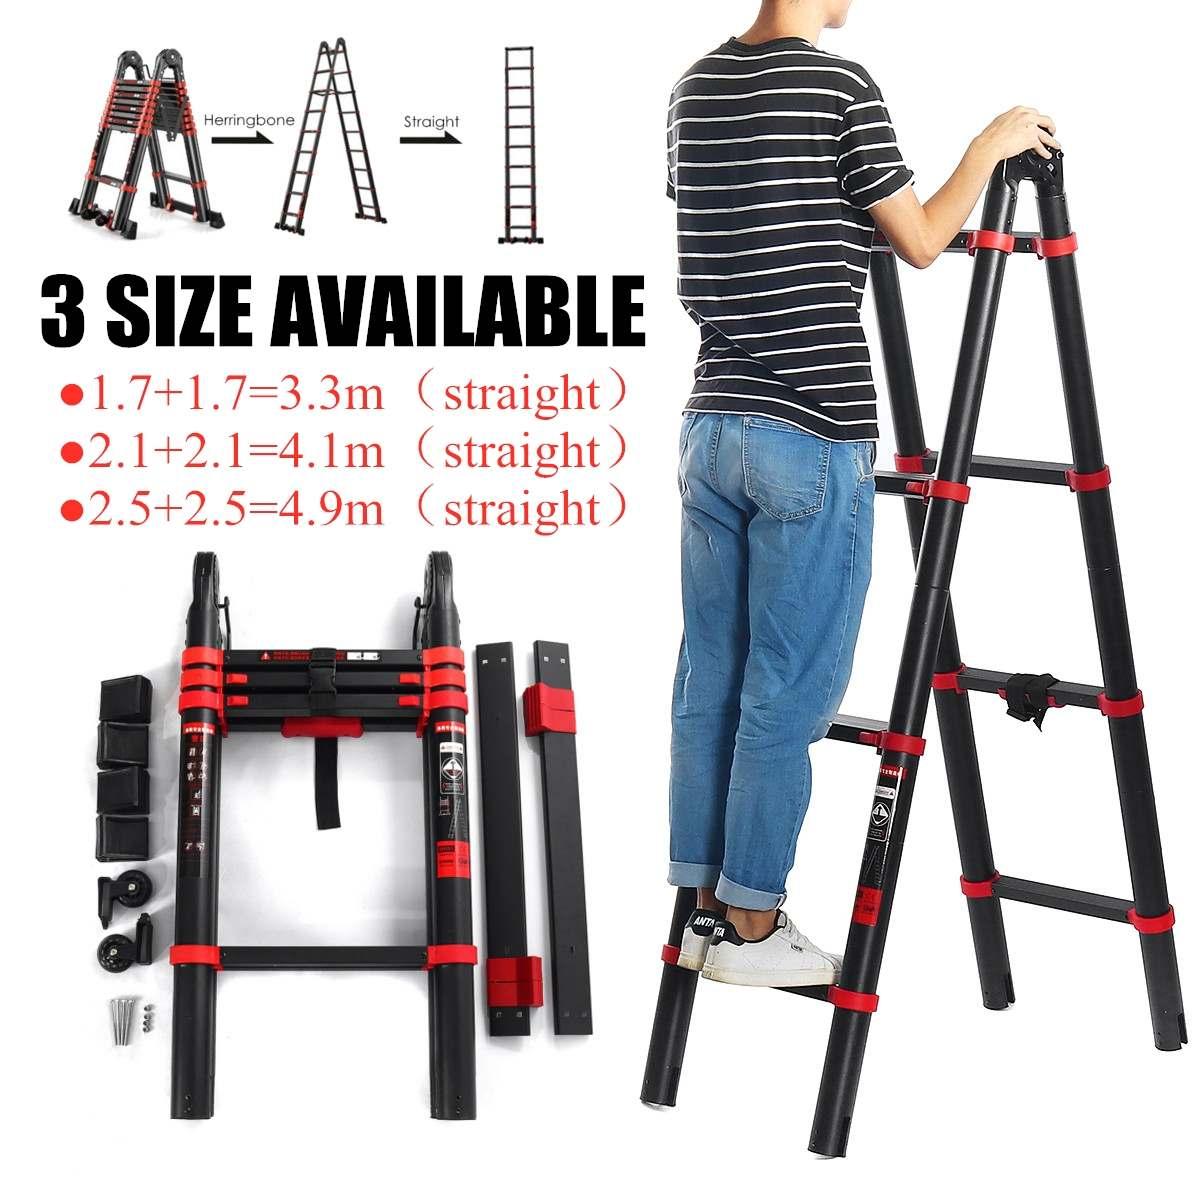 4.1M Telescoping Dual-Use Herringbone Ladder Multifunctional Extension Tools Width 82mm Aluminium Ladders 5 Steps